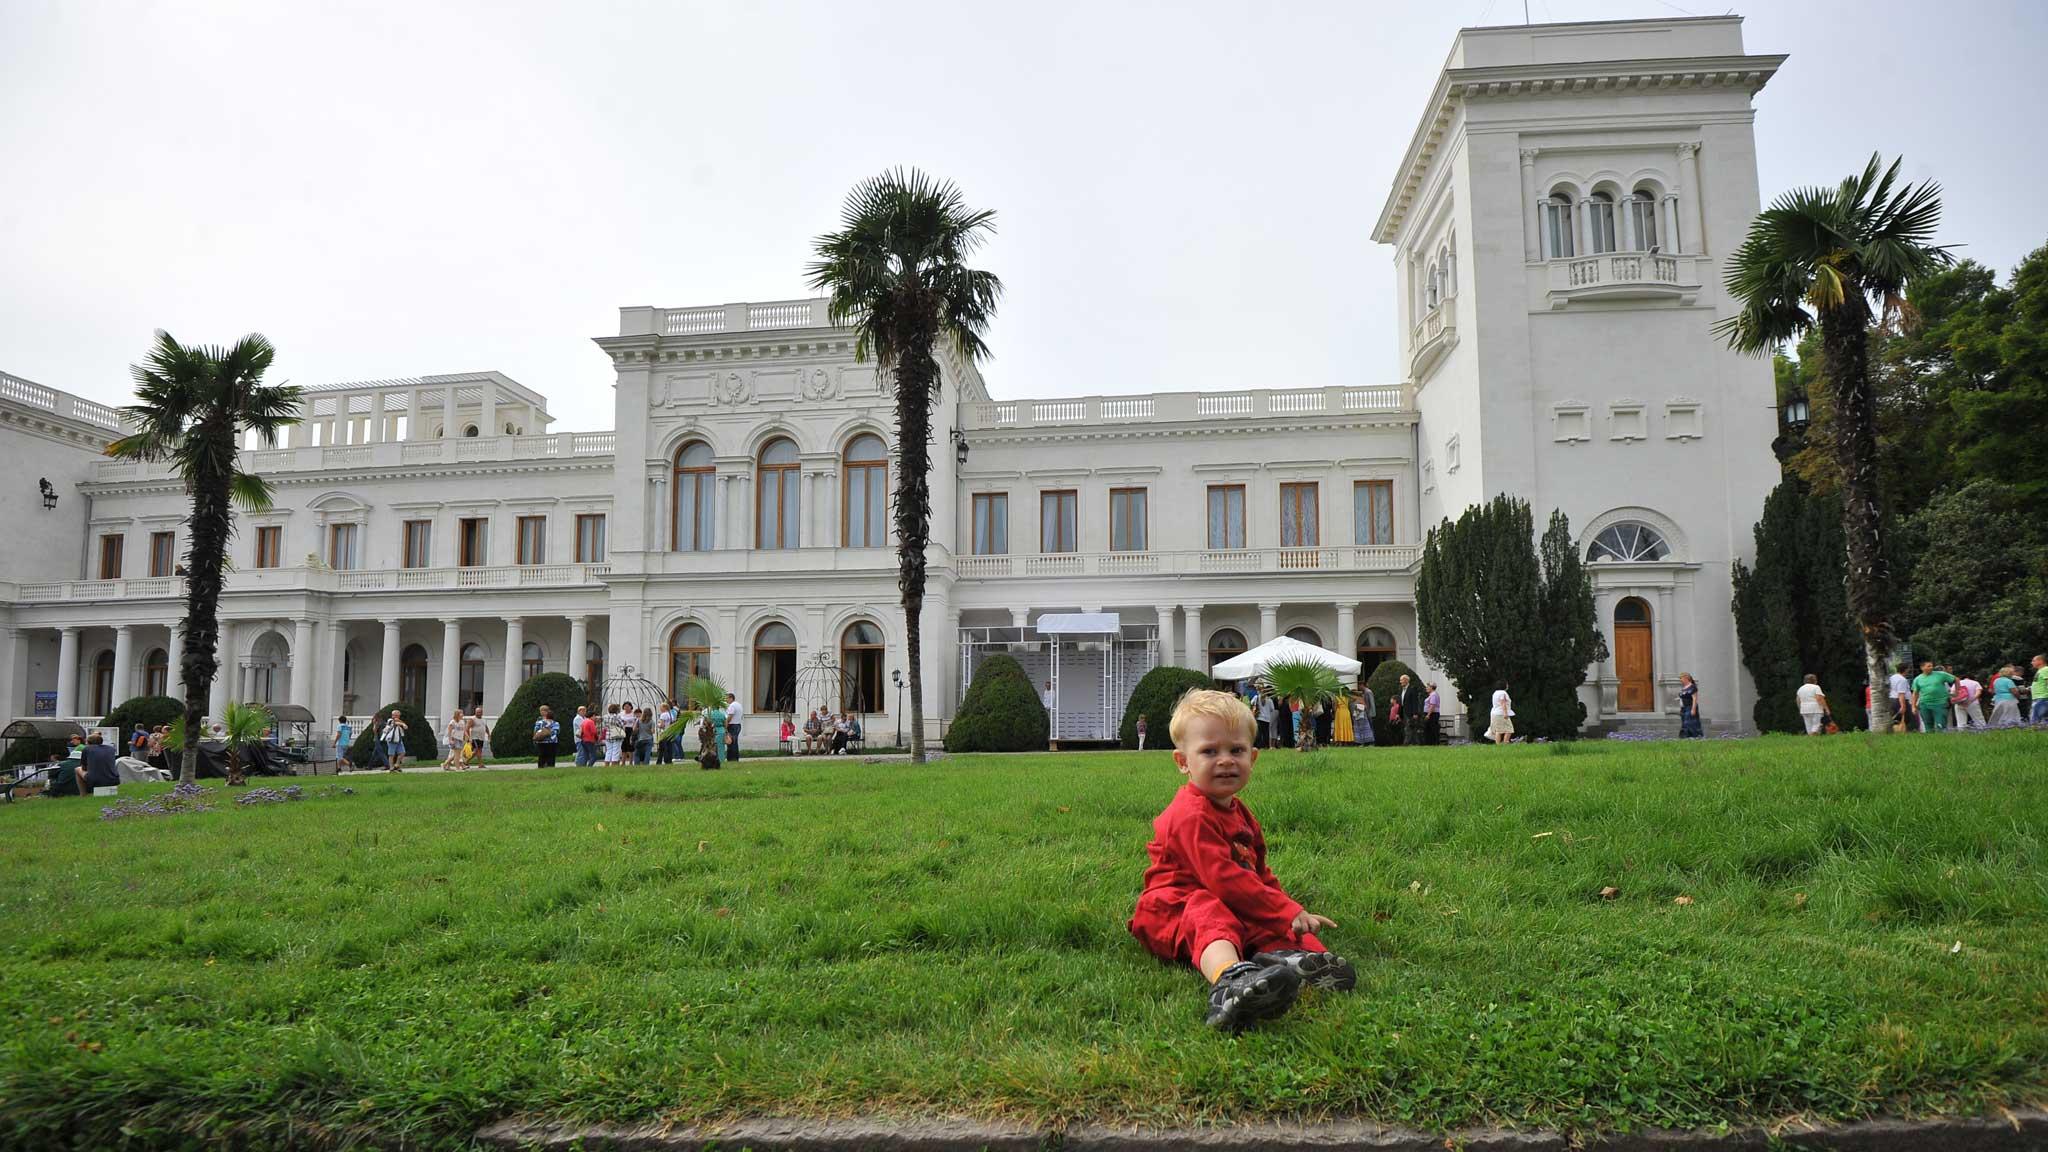 Ливадийский дворец и ребенок